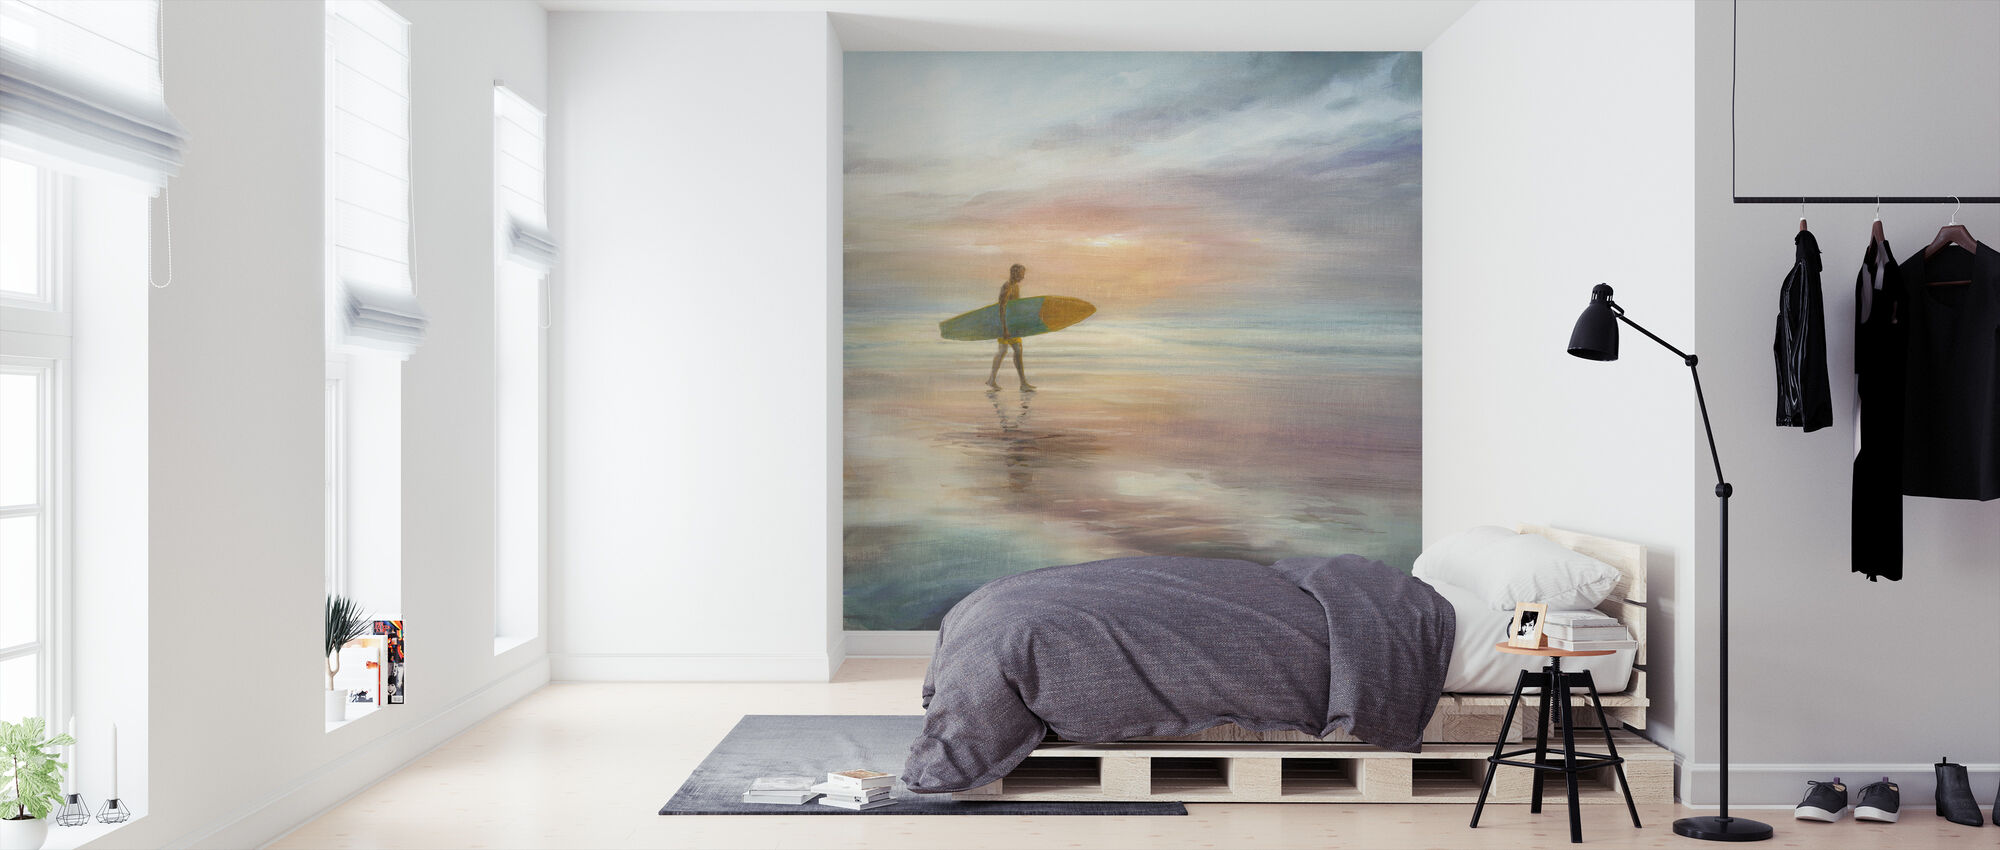 Surfside - Wallpaper - Bedroom